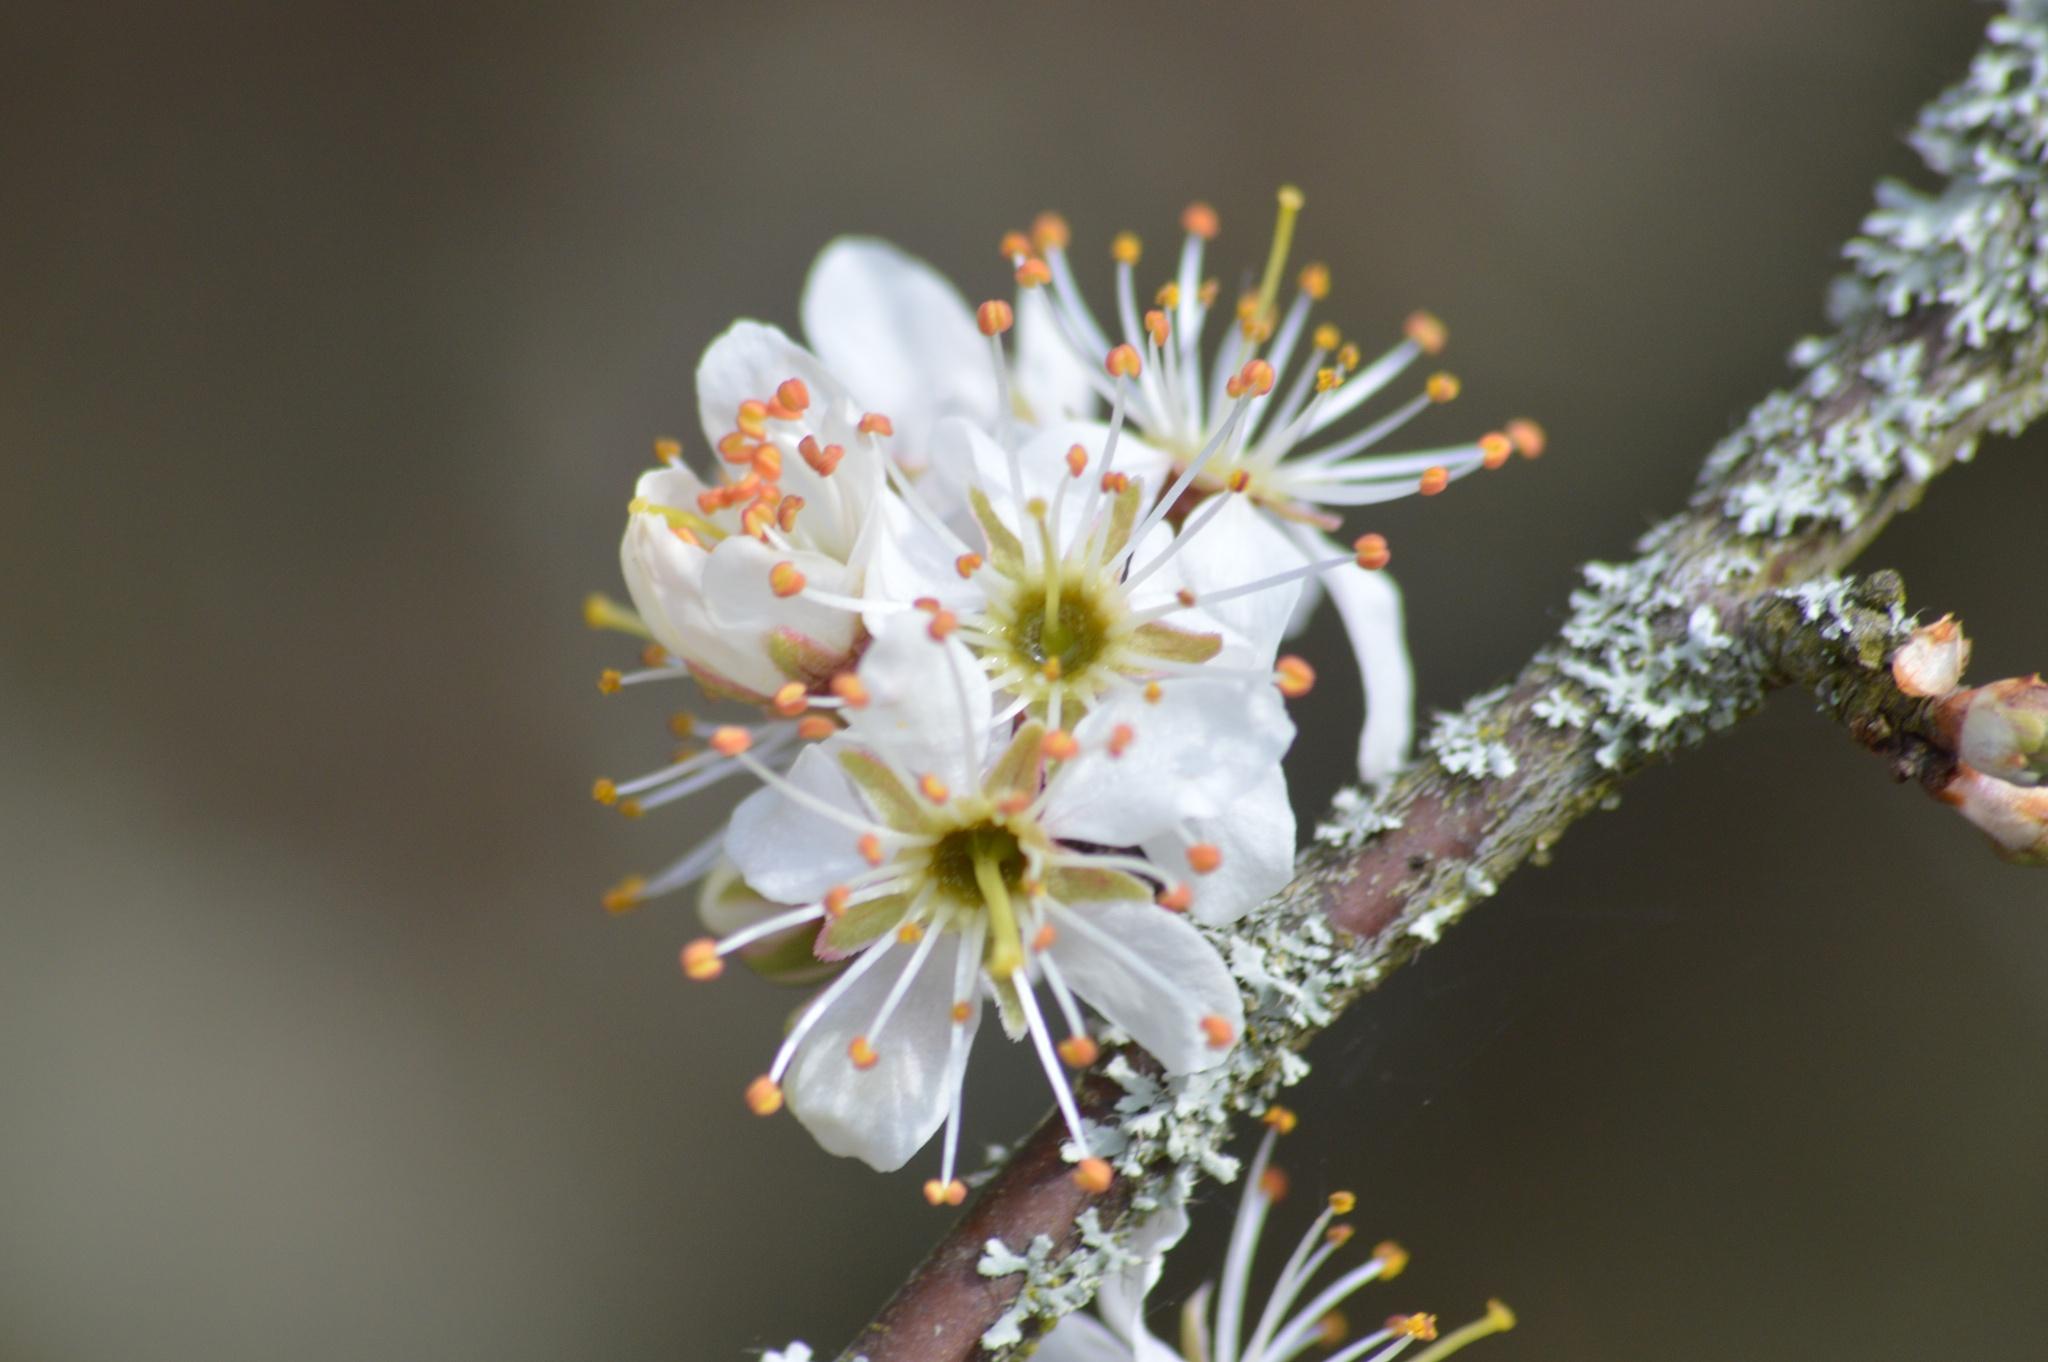 spring as sprung by ntec01